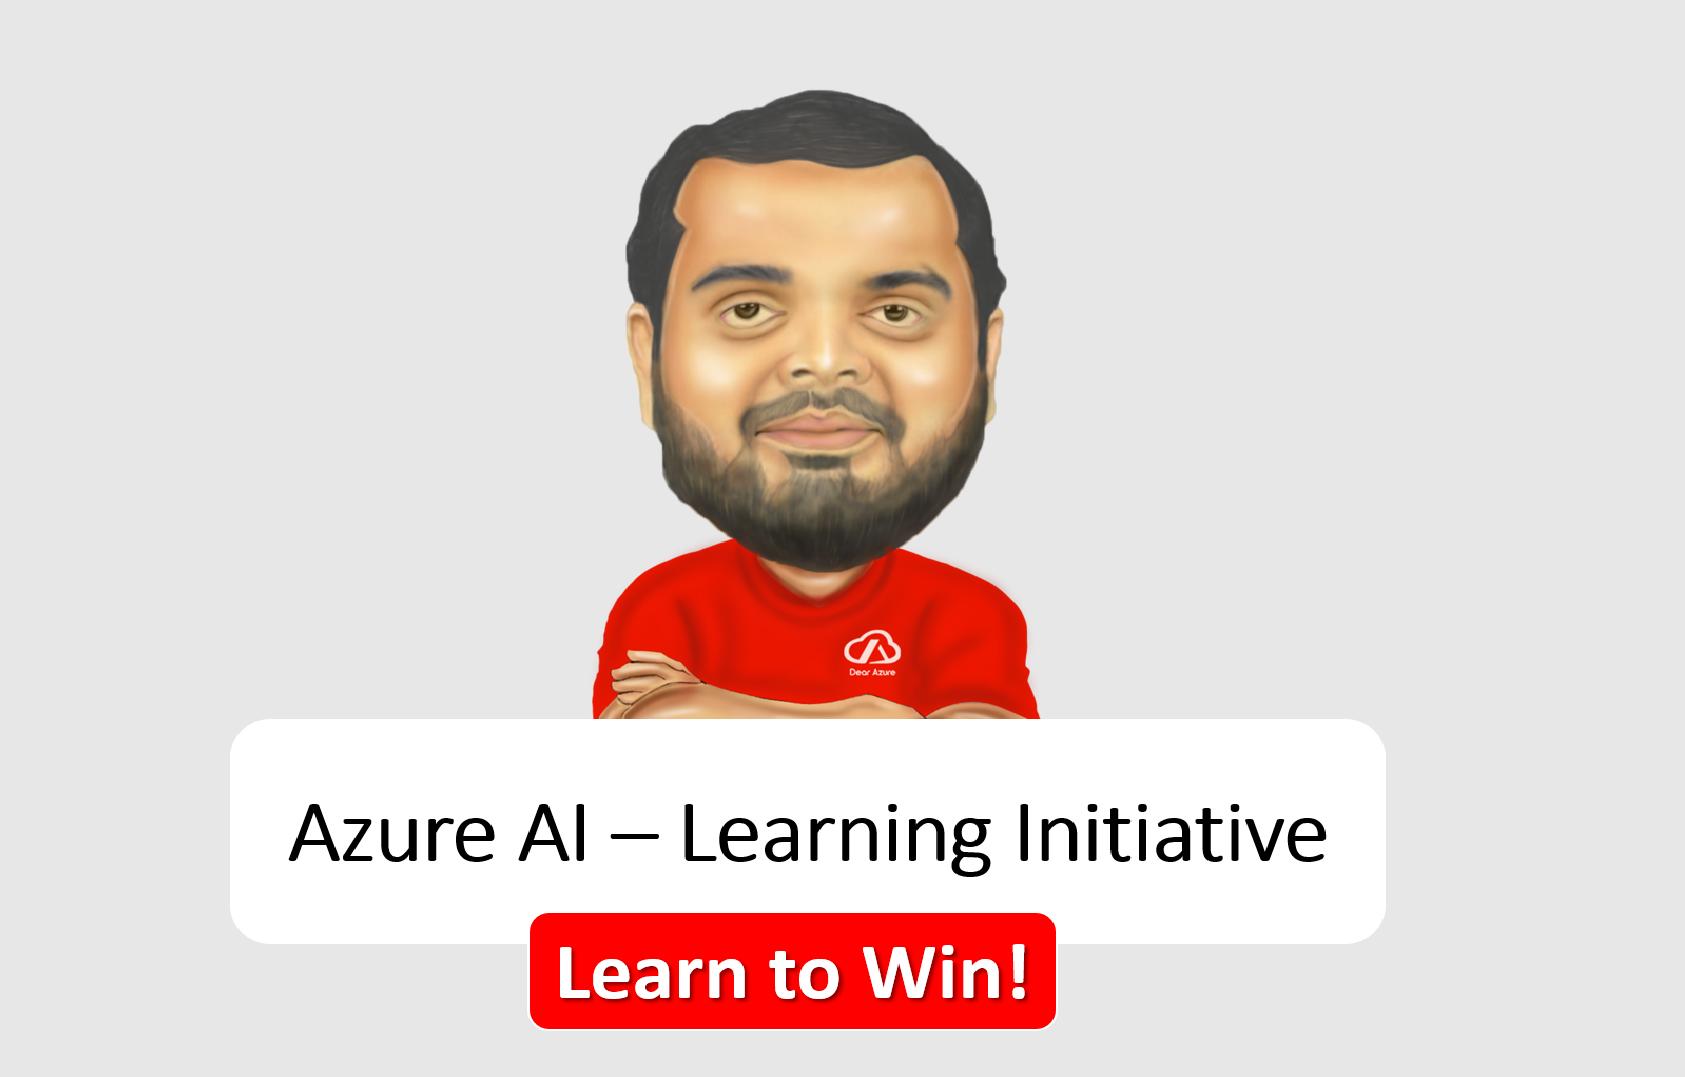 Azure AI – Learning Initiative 👩💻 🎟️ 📚 – Learn to Win! [Winners Announced]